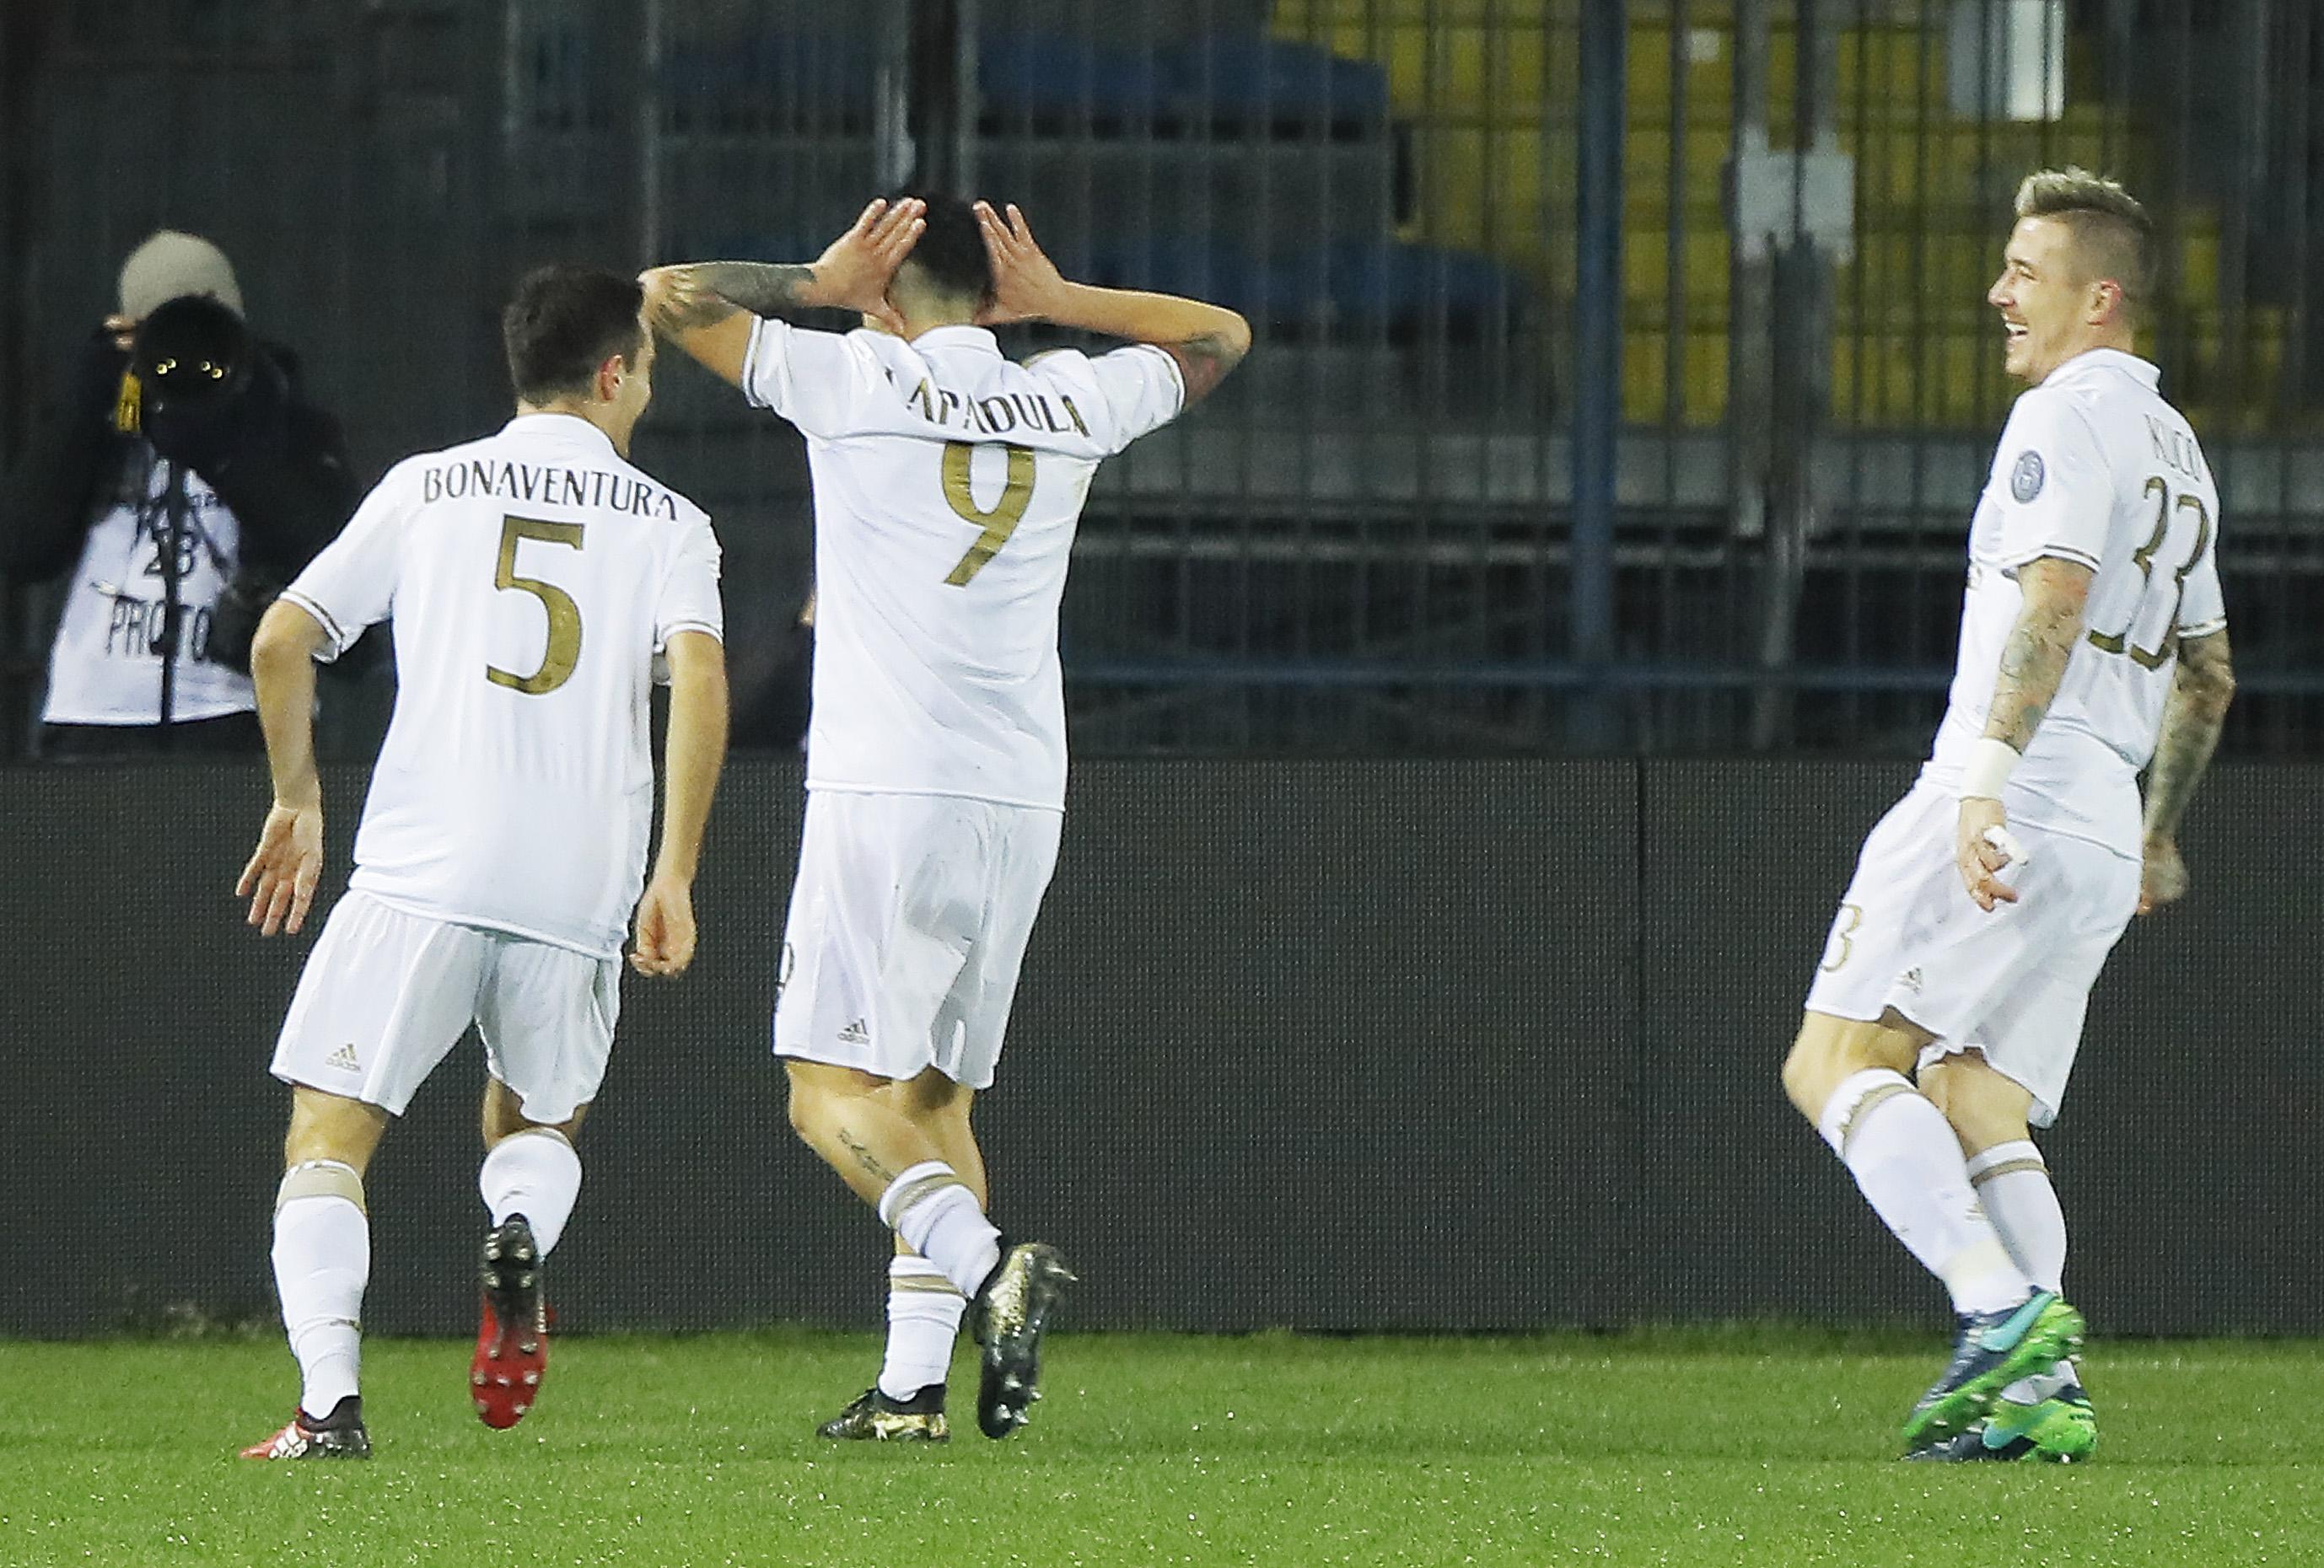 Serie A: Milan, poker all'Empoli e 2° posto da solo